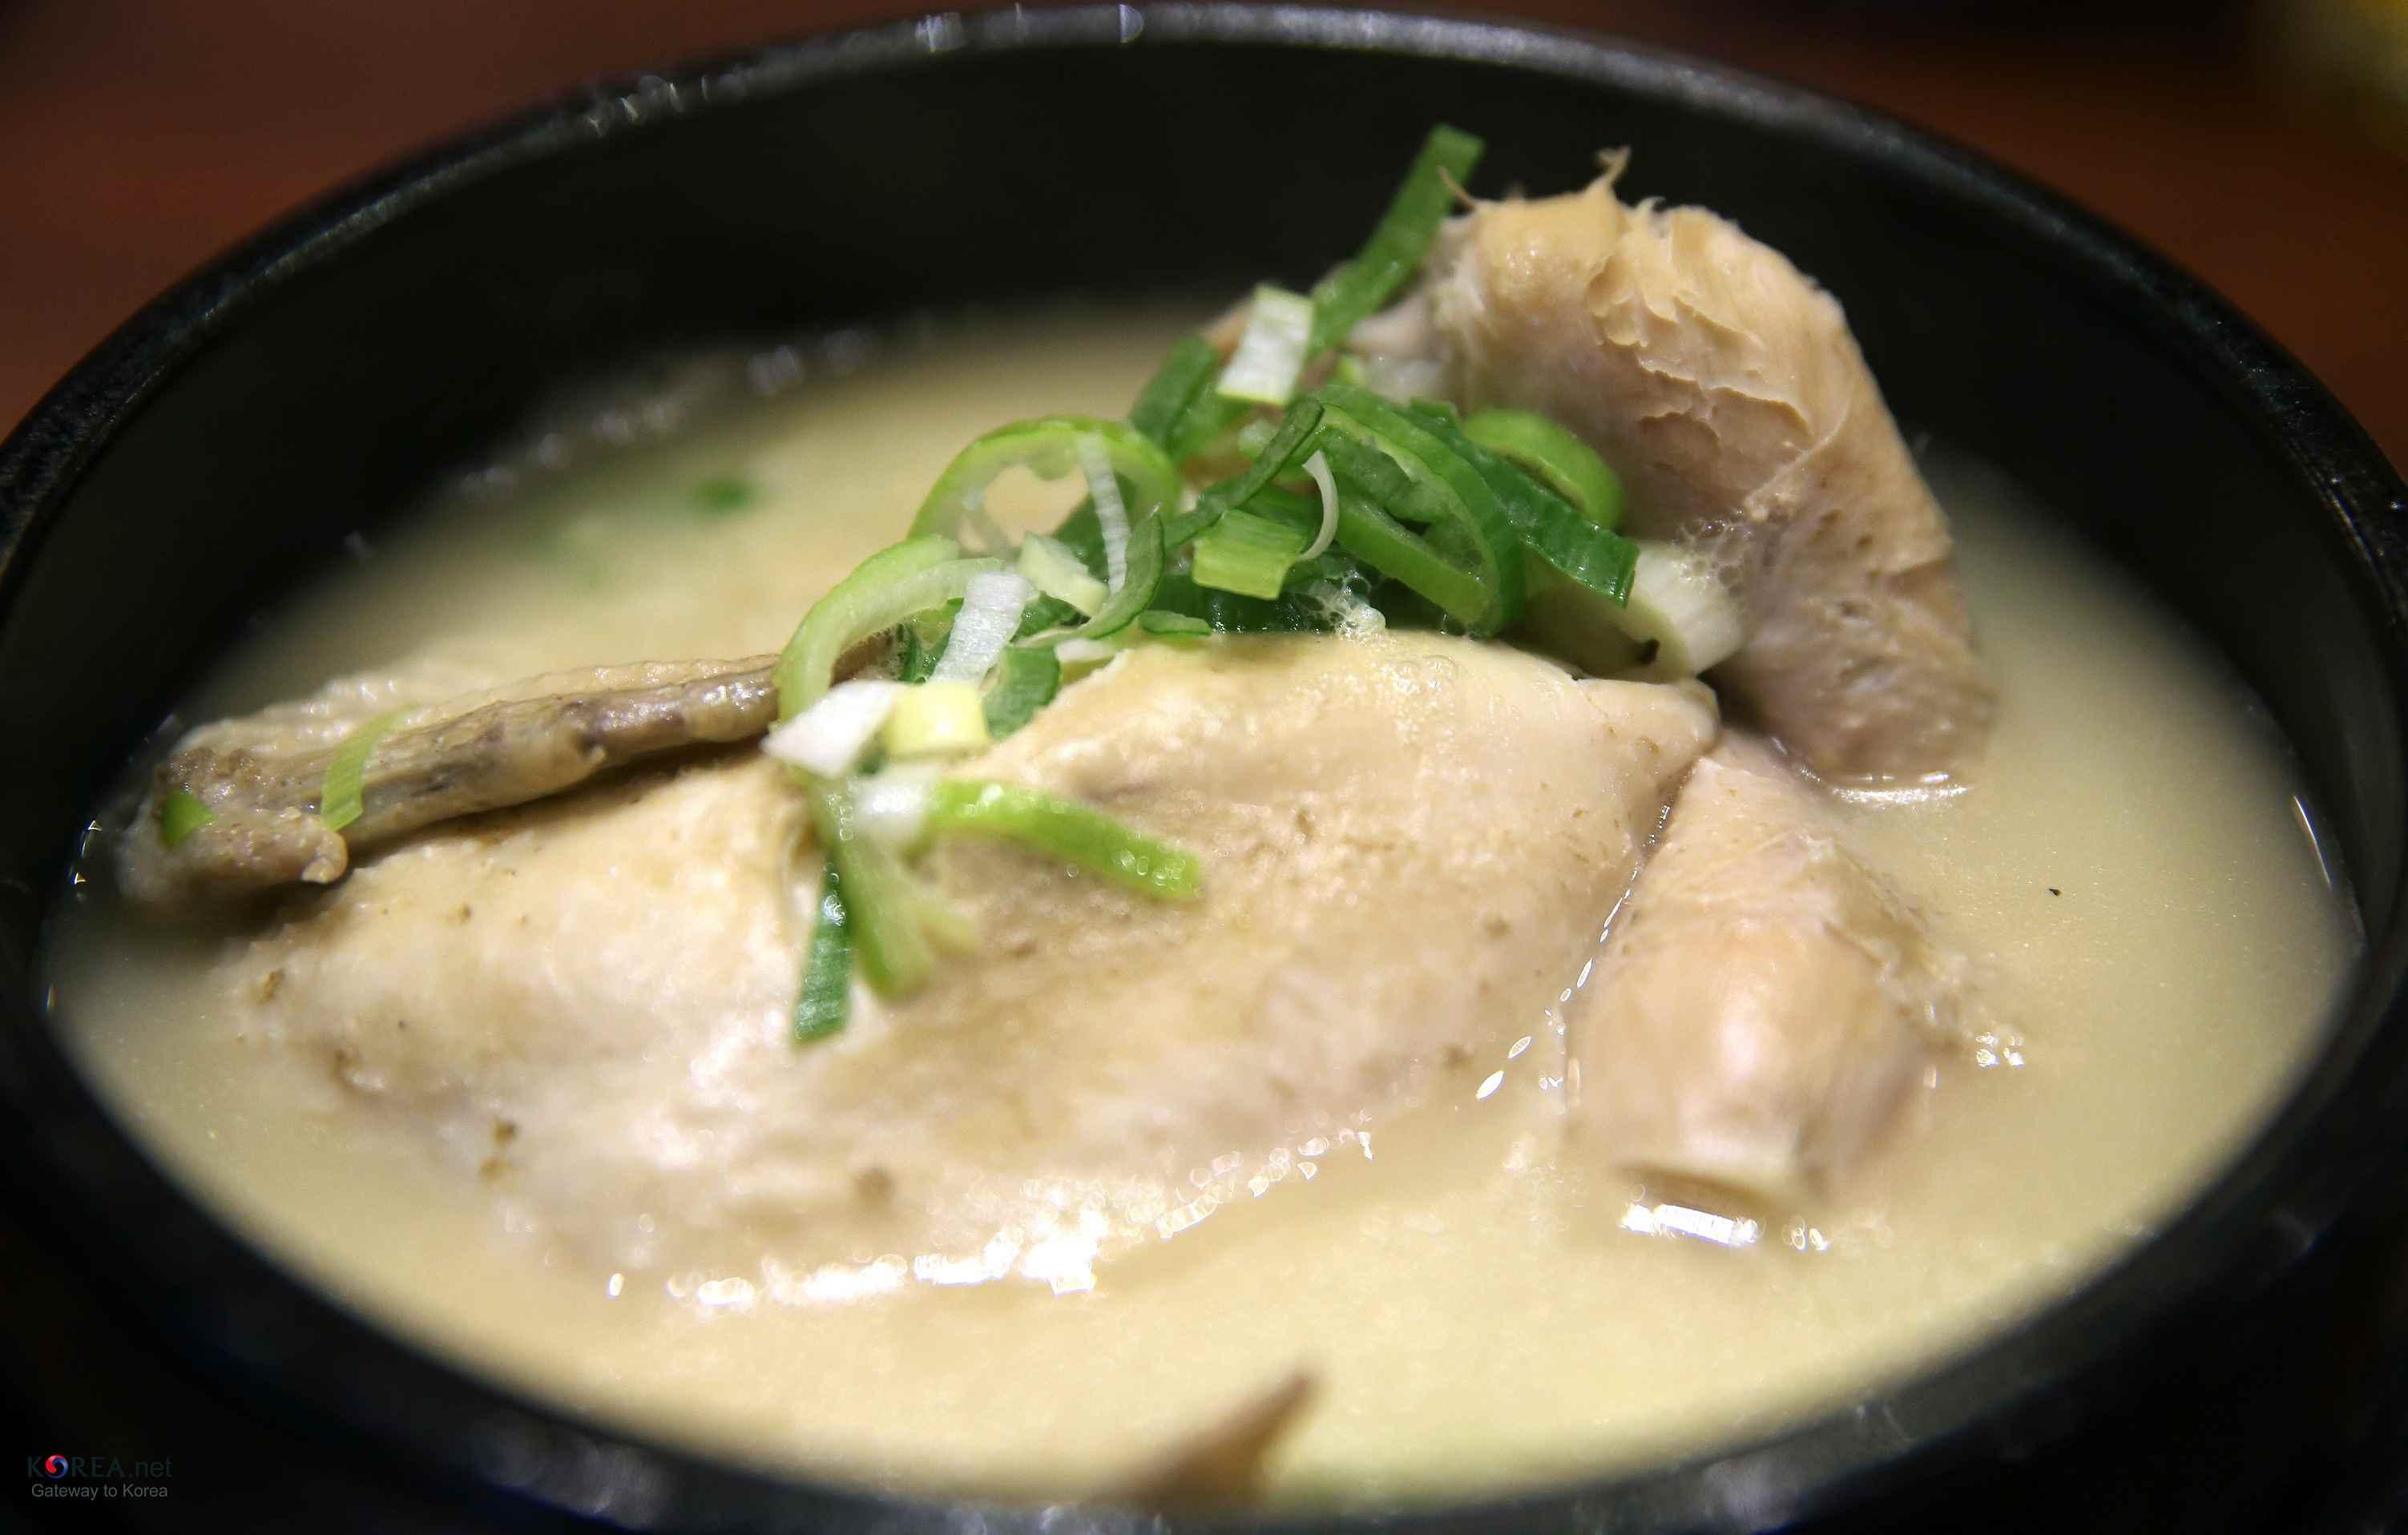 Samgyetang (Chinken soup with ginseng)